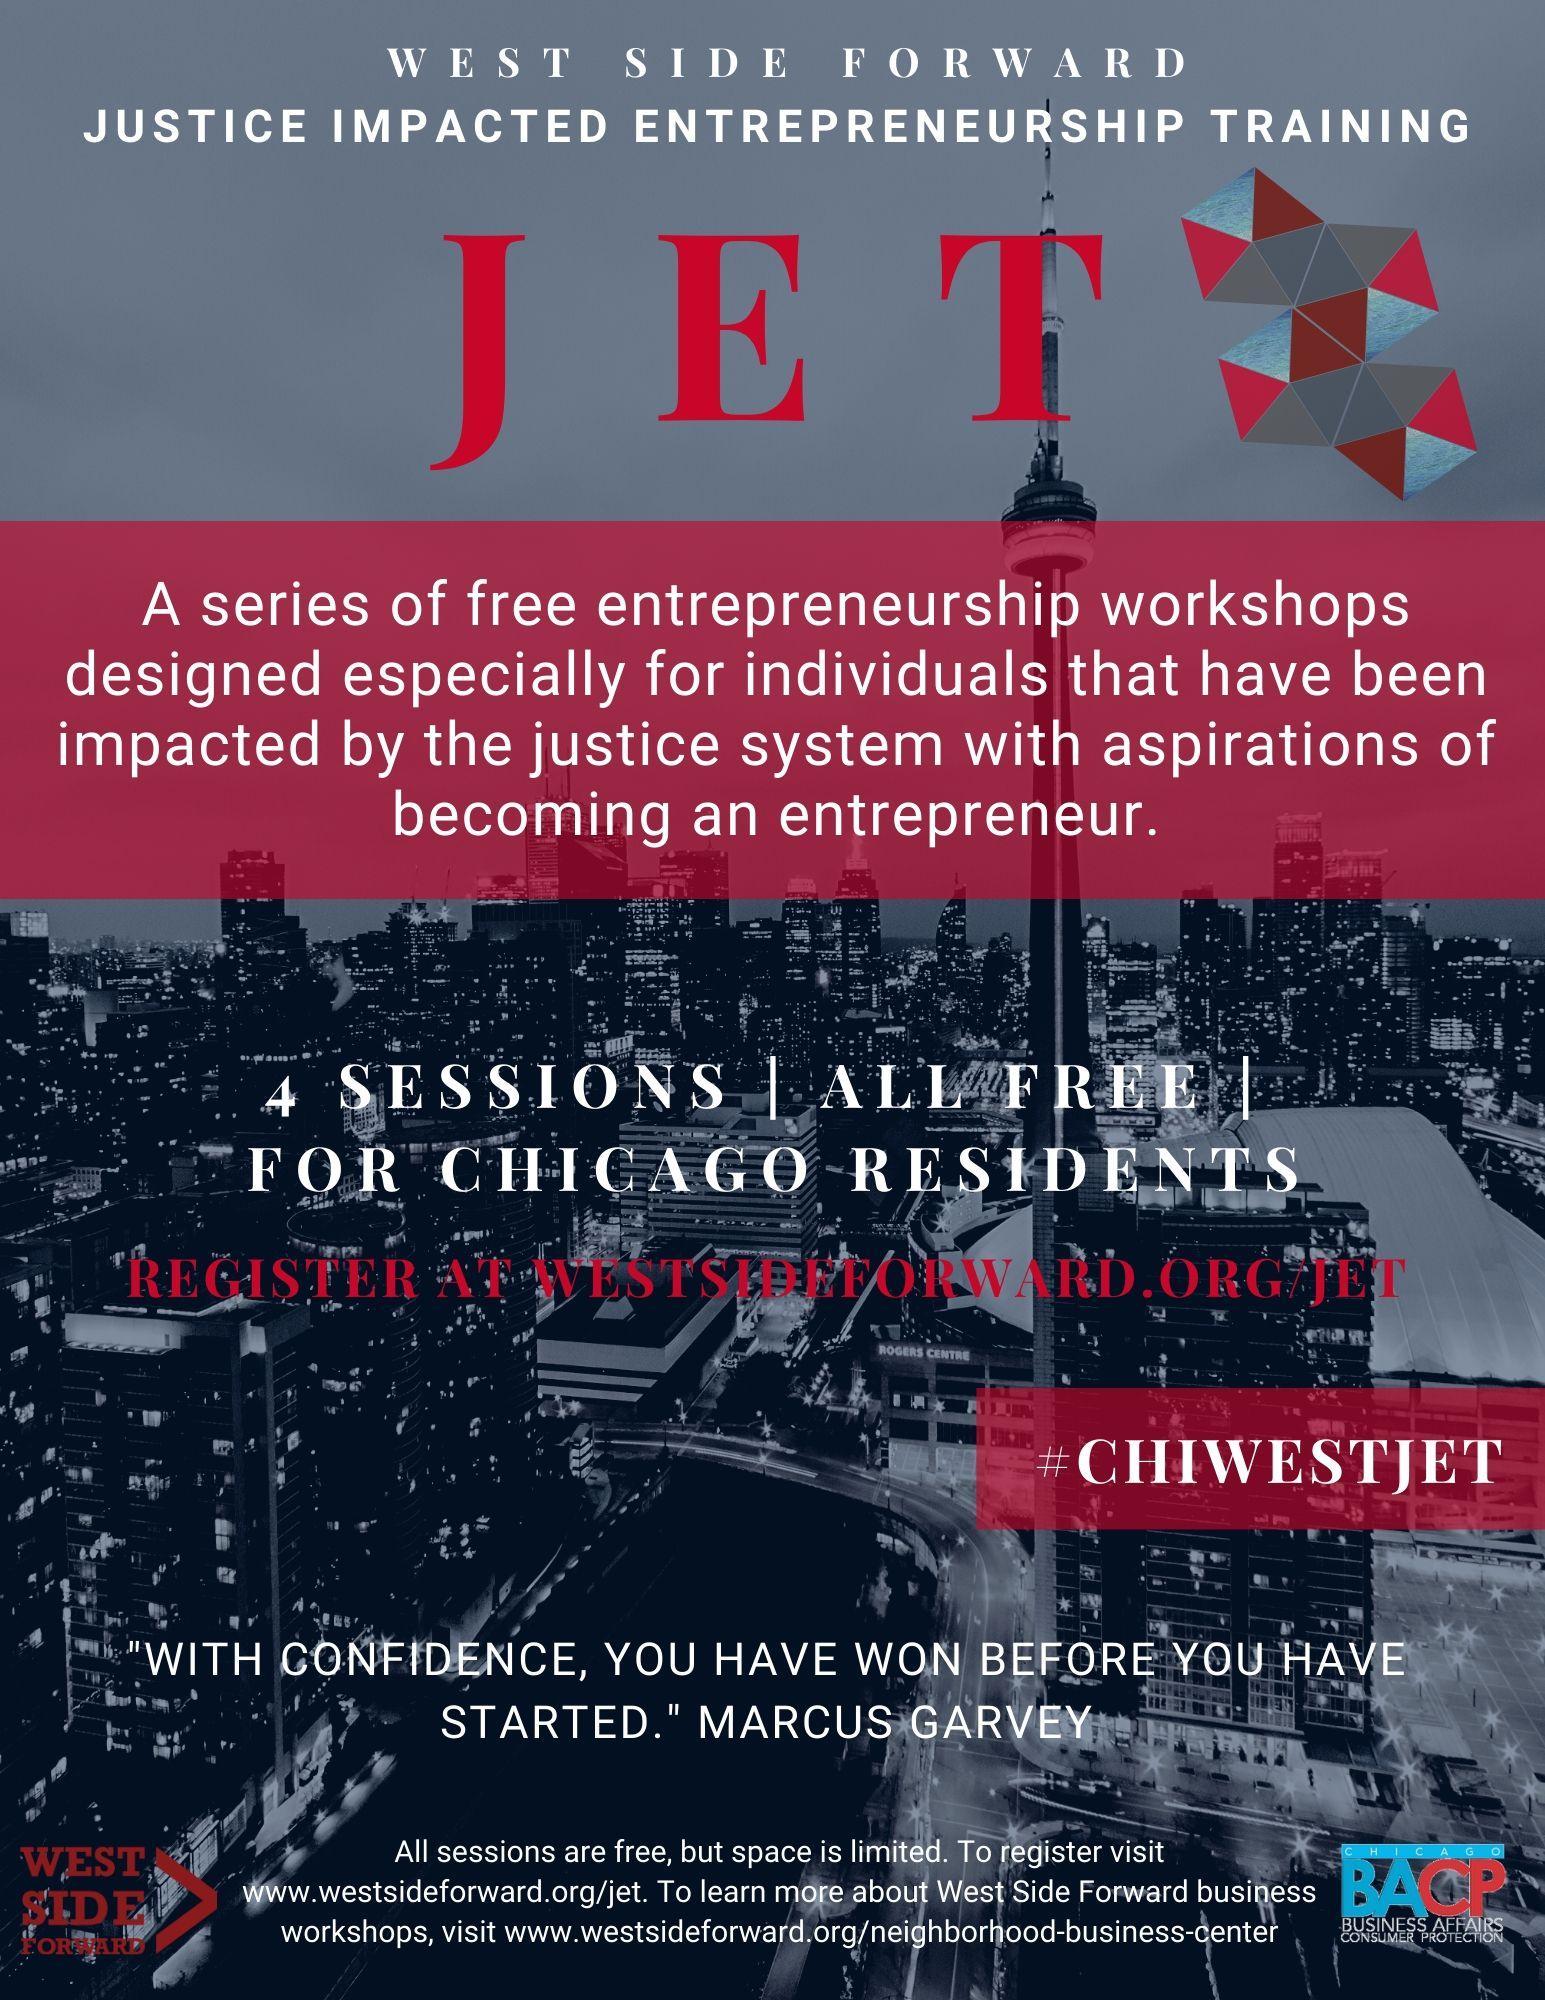 Justice Impacted Entrepreneurship Training